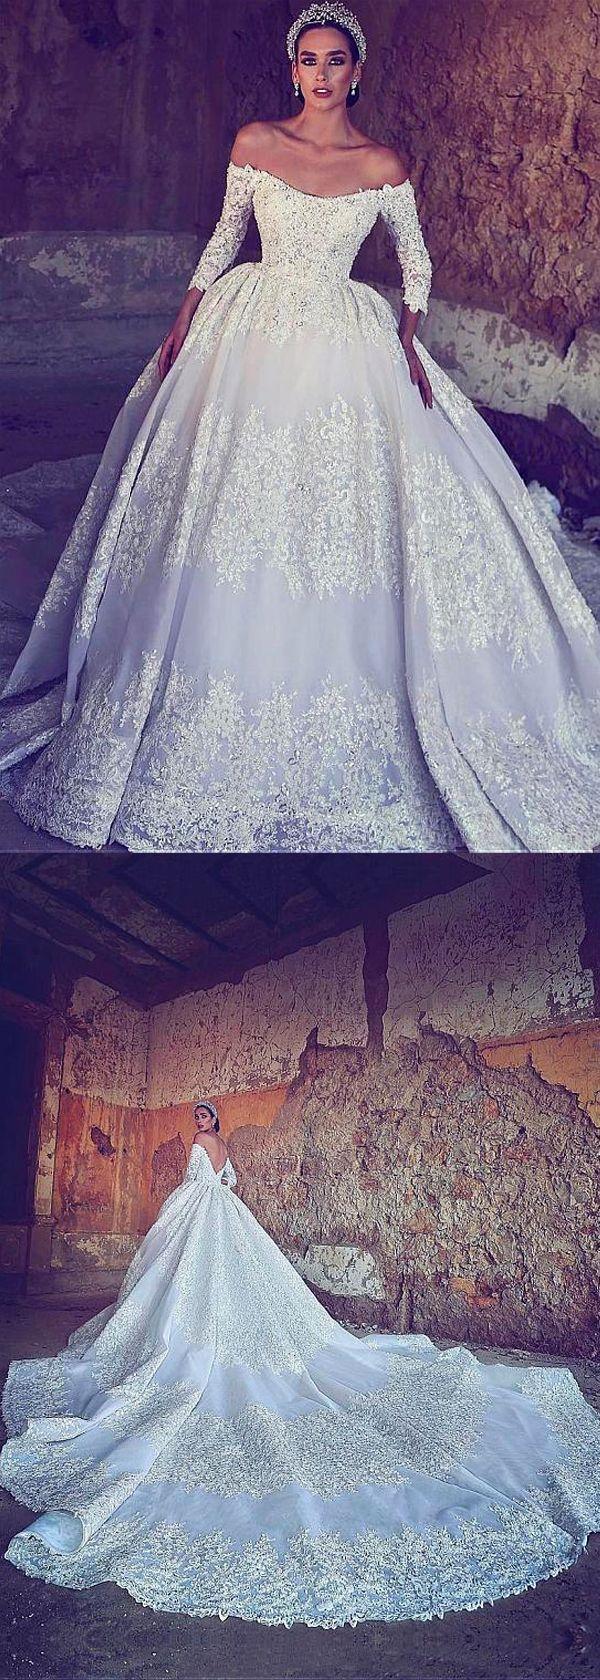 pinterest: @isabubs | my wedding | Pinterest | Vestidos de novia, De ...